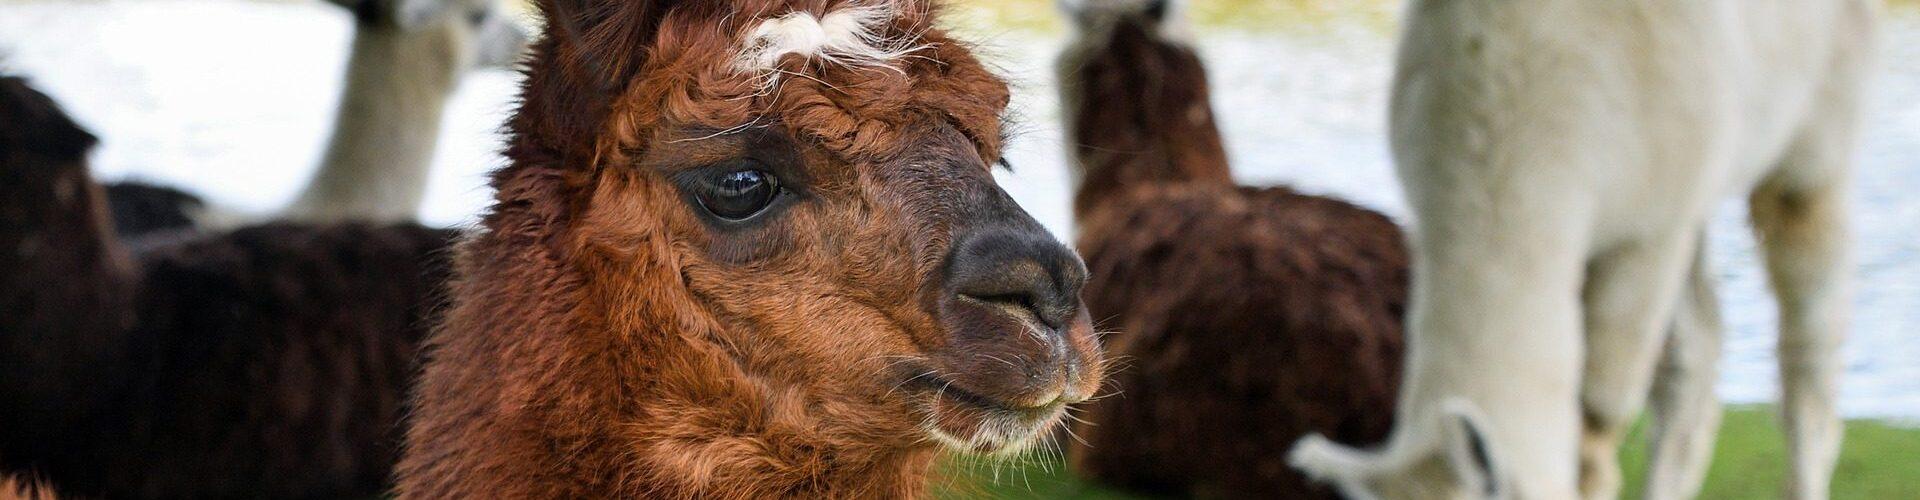 alpaca-2459599_1920 (1)